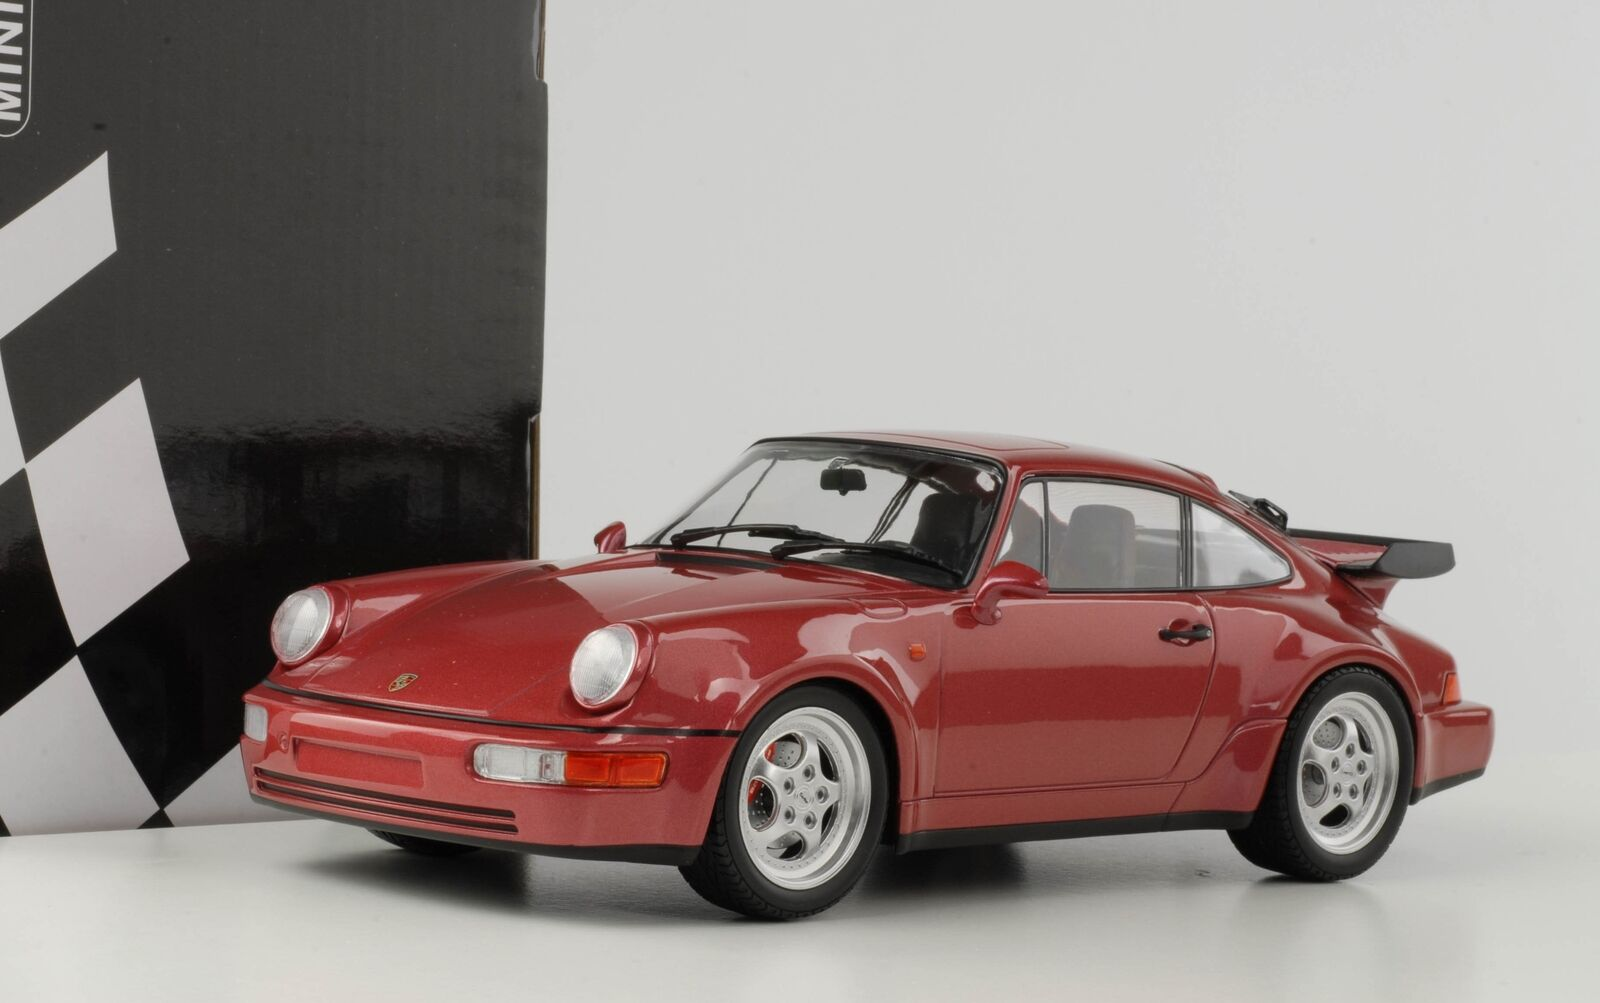 Porsche 911 964 3.6 Turbo red Métallique Diecast 1 18 Minichamps 155069100